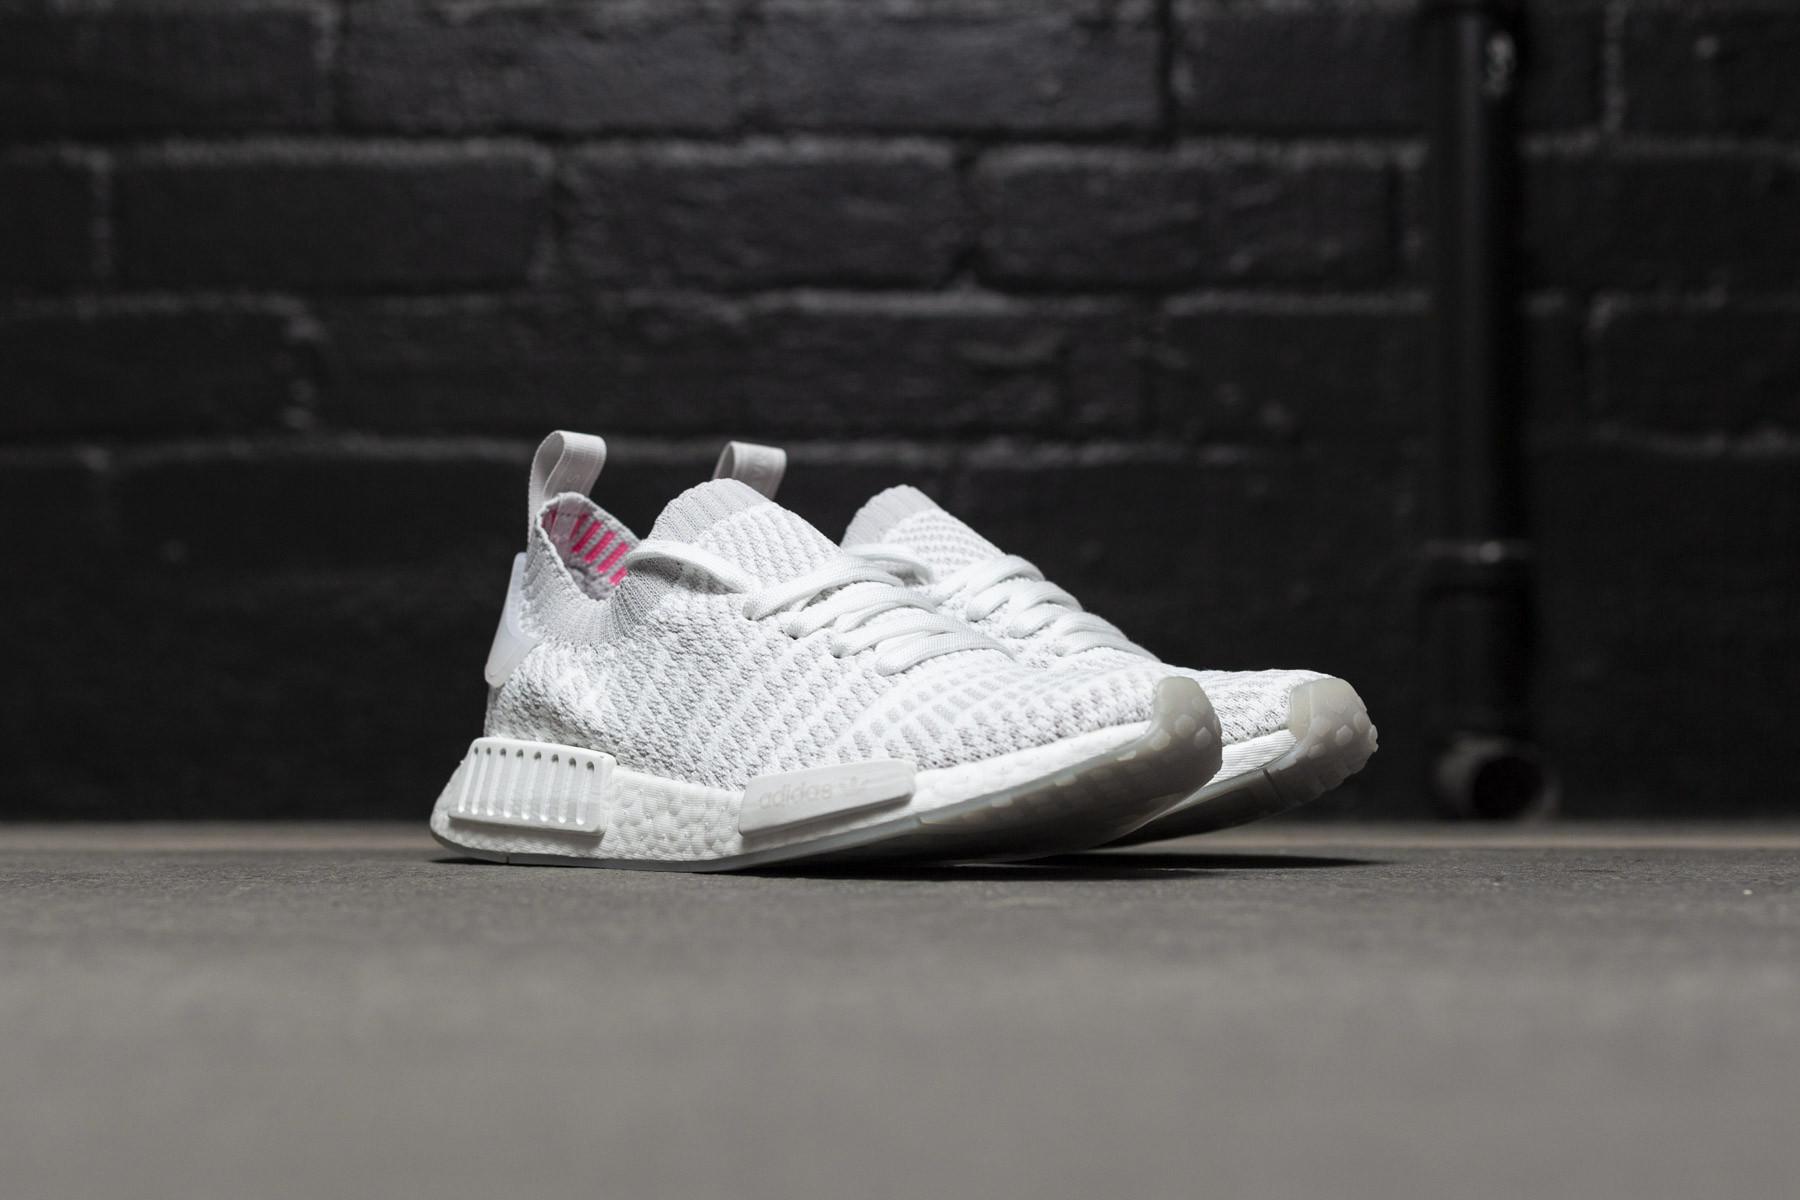 Adidas NMD_R1 STLT PK Sneaker.no